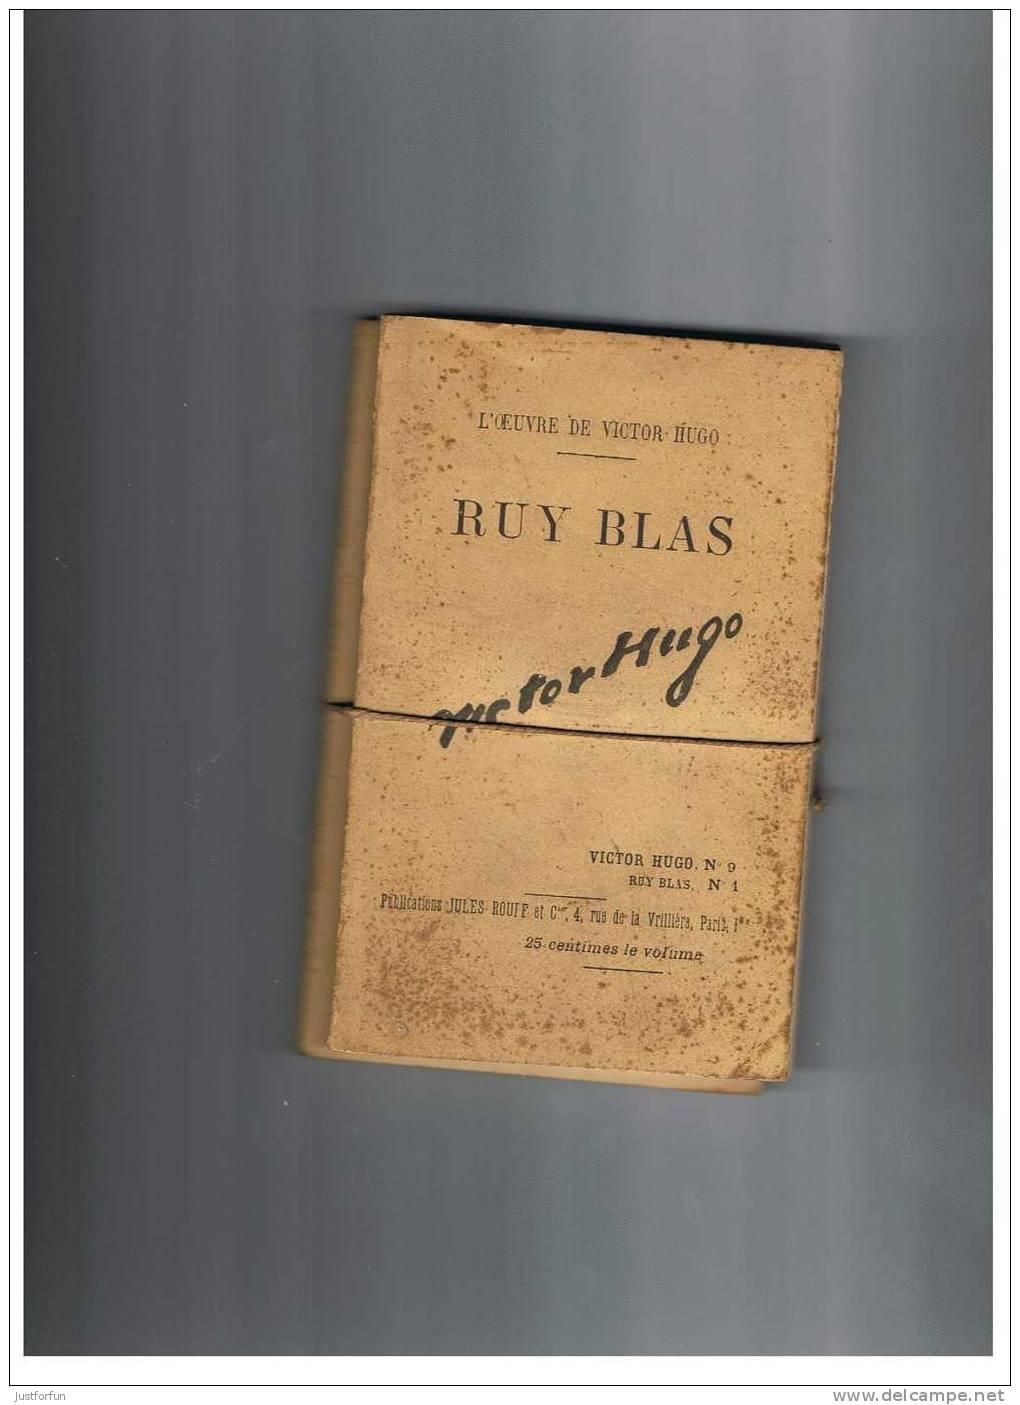 VICTOR HUGO ( RUY BLAS  éditeurs Jules Rouff)  Nr 9,10 - Livres, BD, Revues